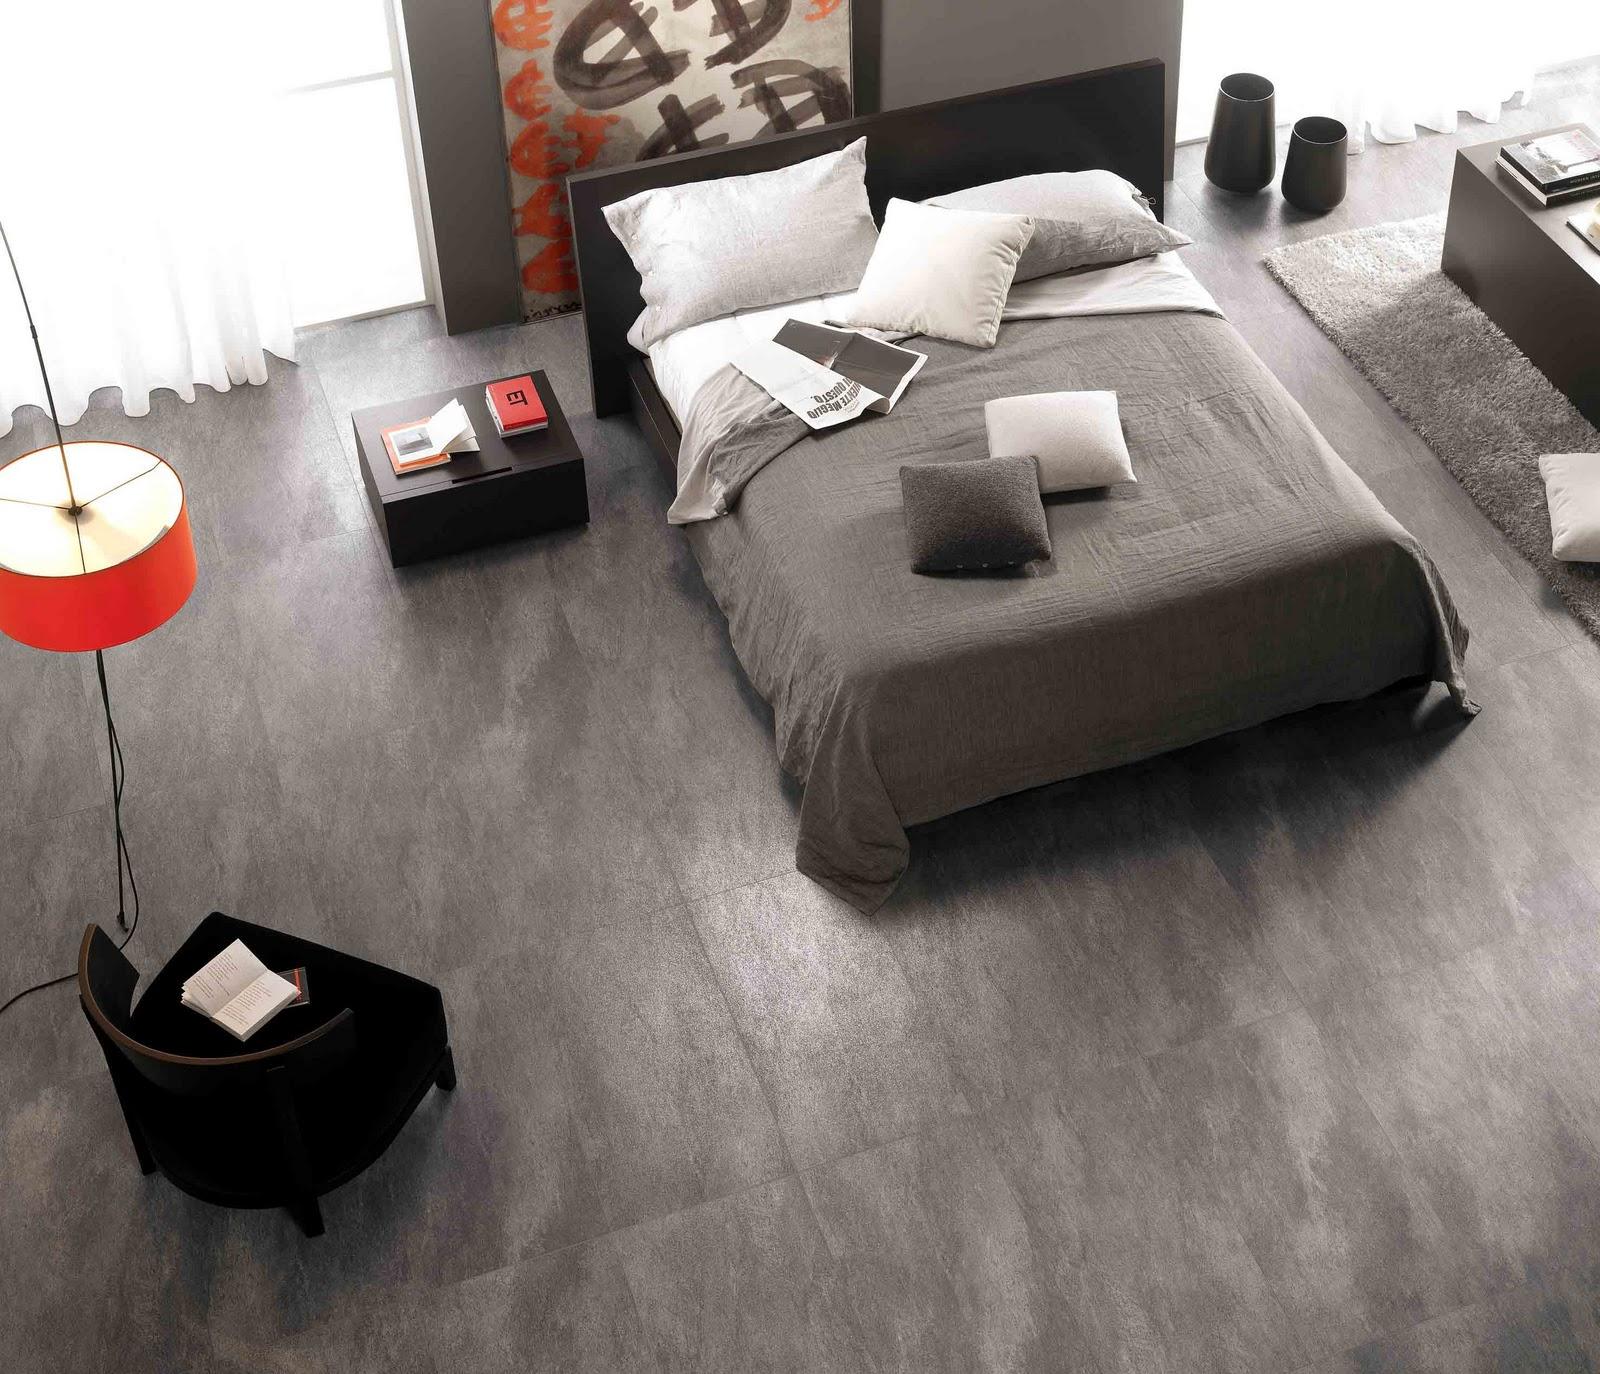 Arredamento moderno pavimenti moderni - Pavimenti per casa moderna ...